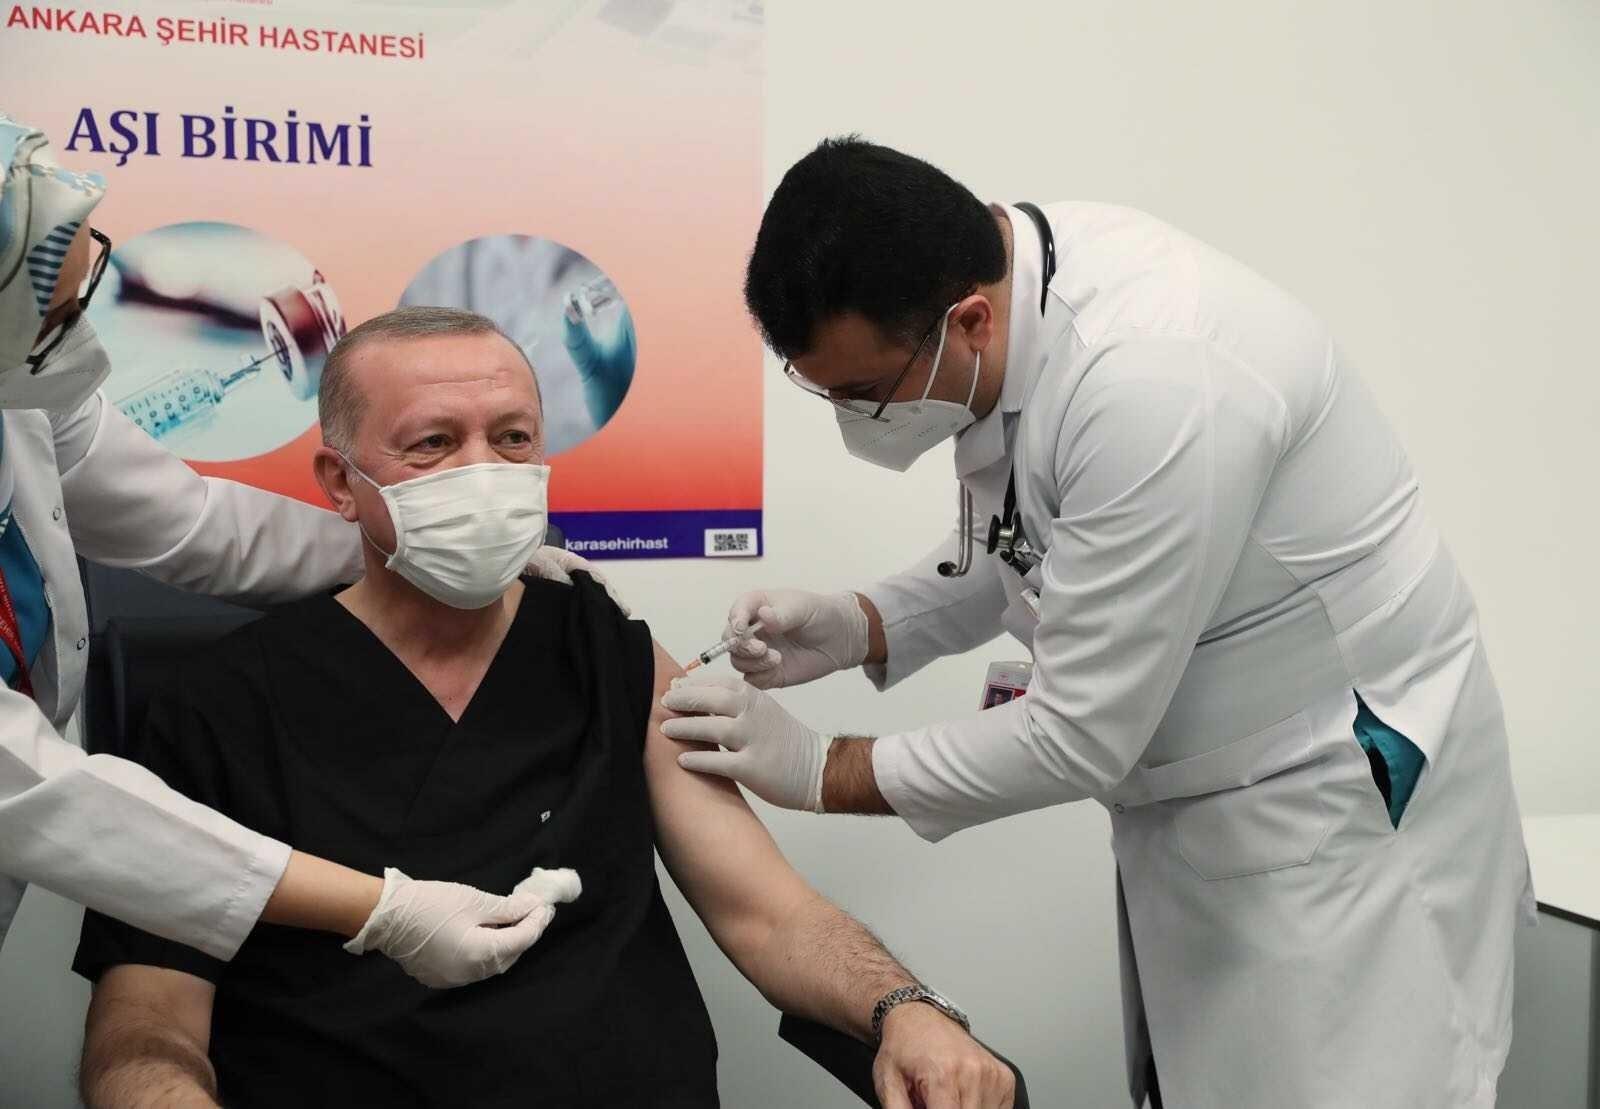 President Recep Tayyip Erdoğan receives the first dose of Sinovac's COVID-19 vaccine at Ankara City Hospital in Turkey's capital Ankara, Jan. 14, 2021.